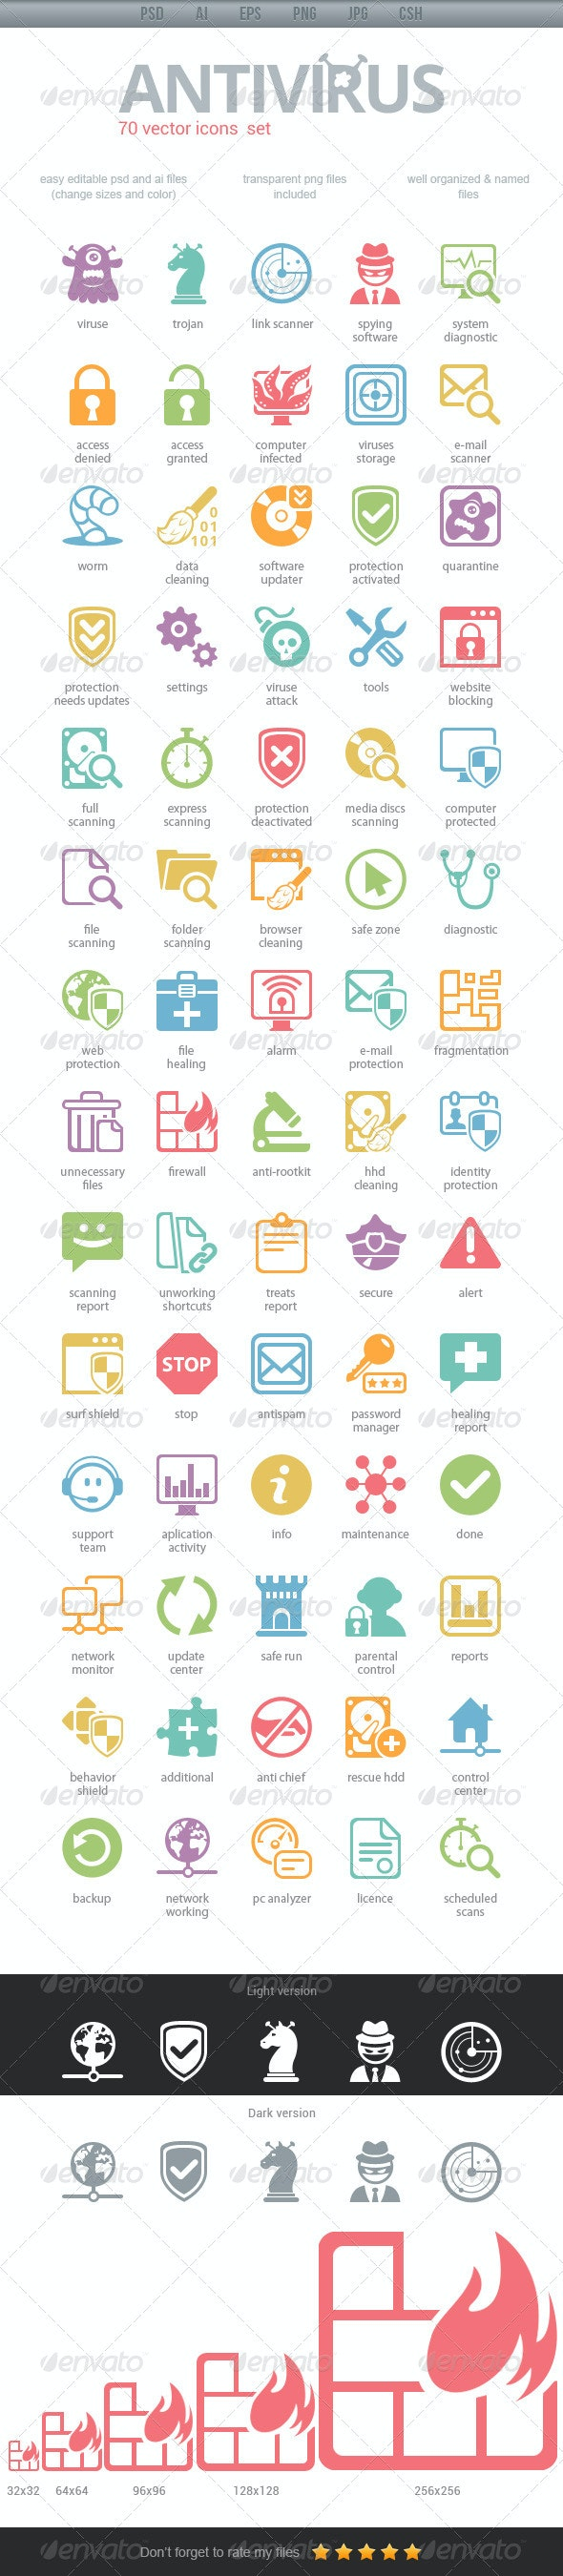 Antivirus Icons - Icons